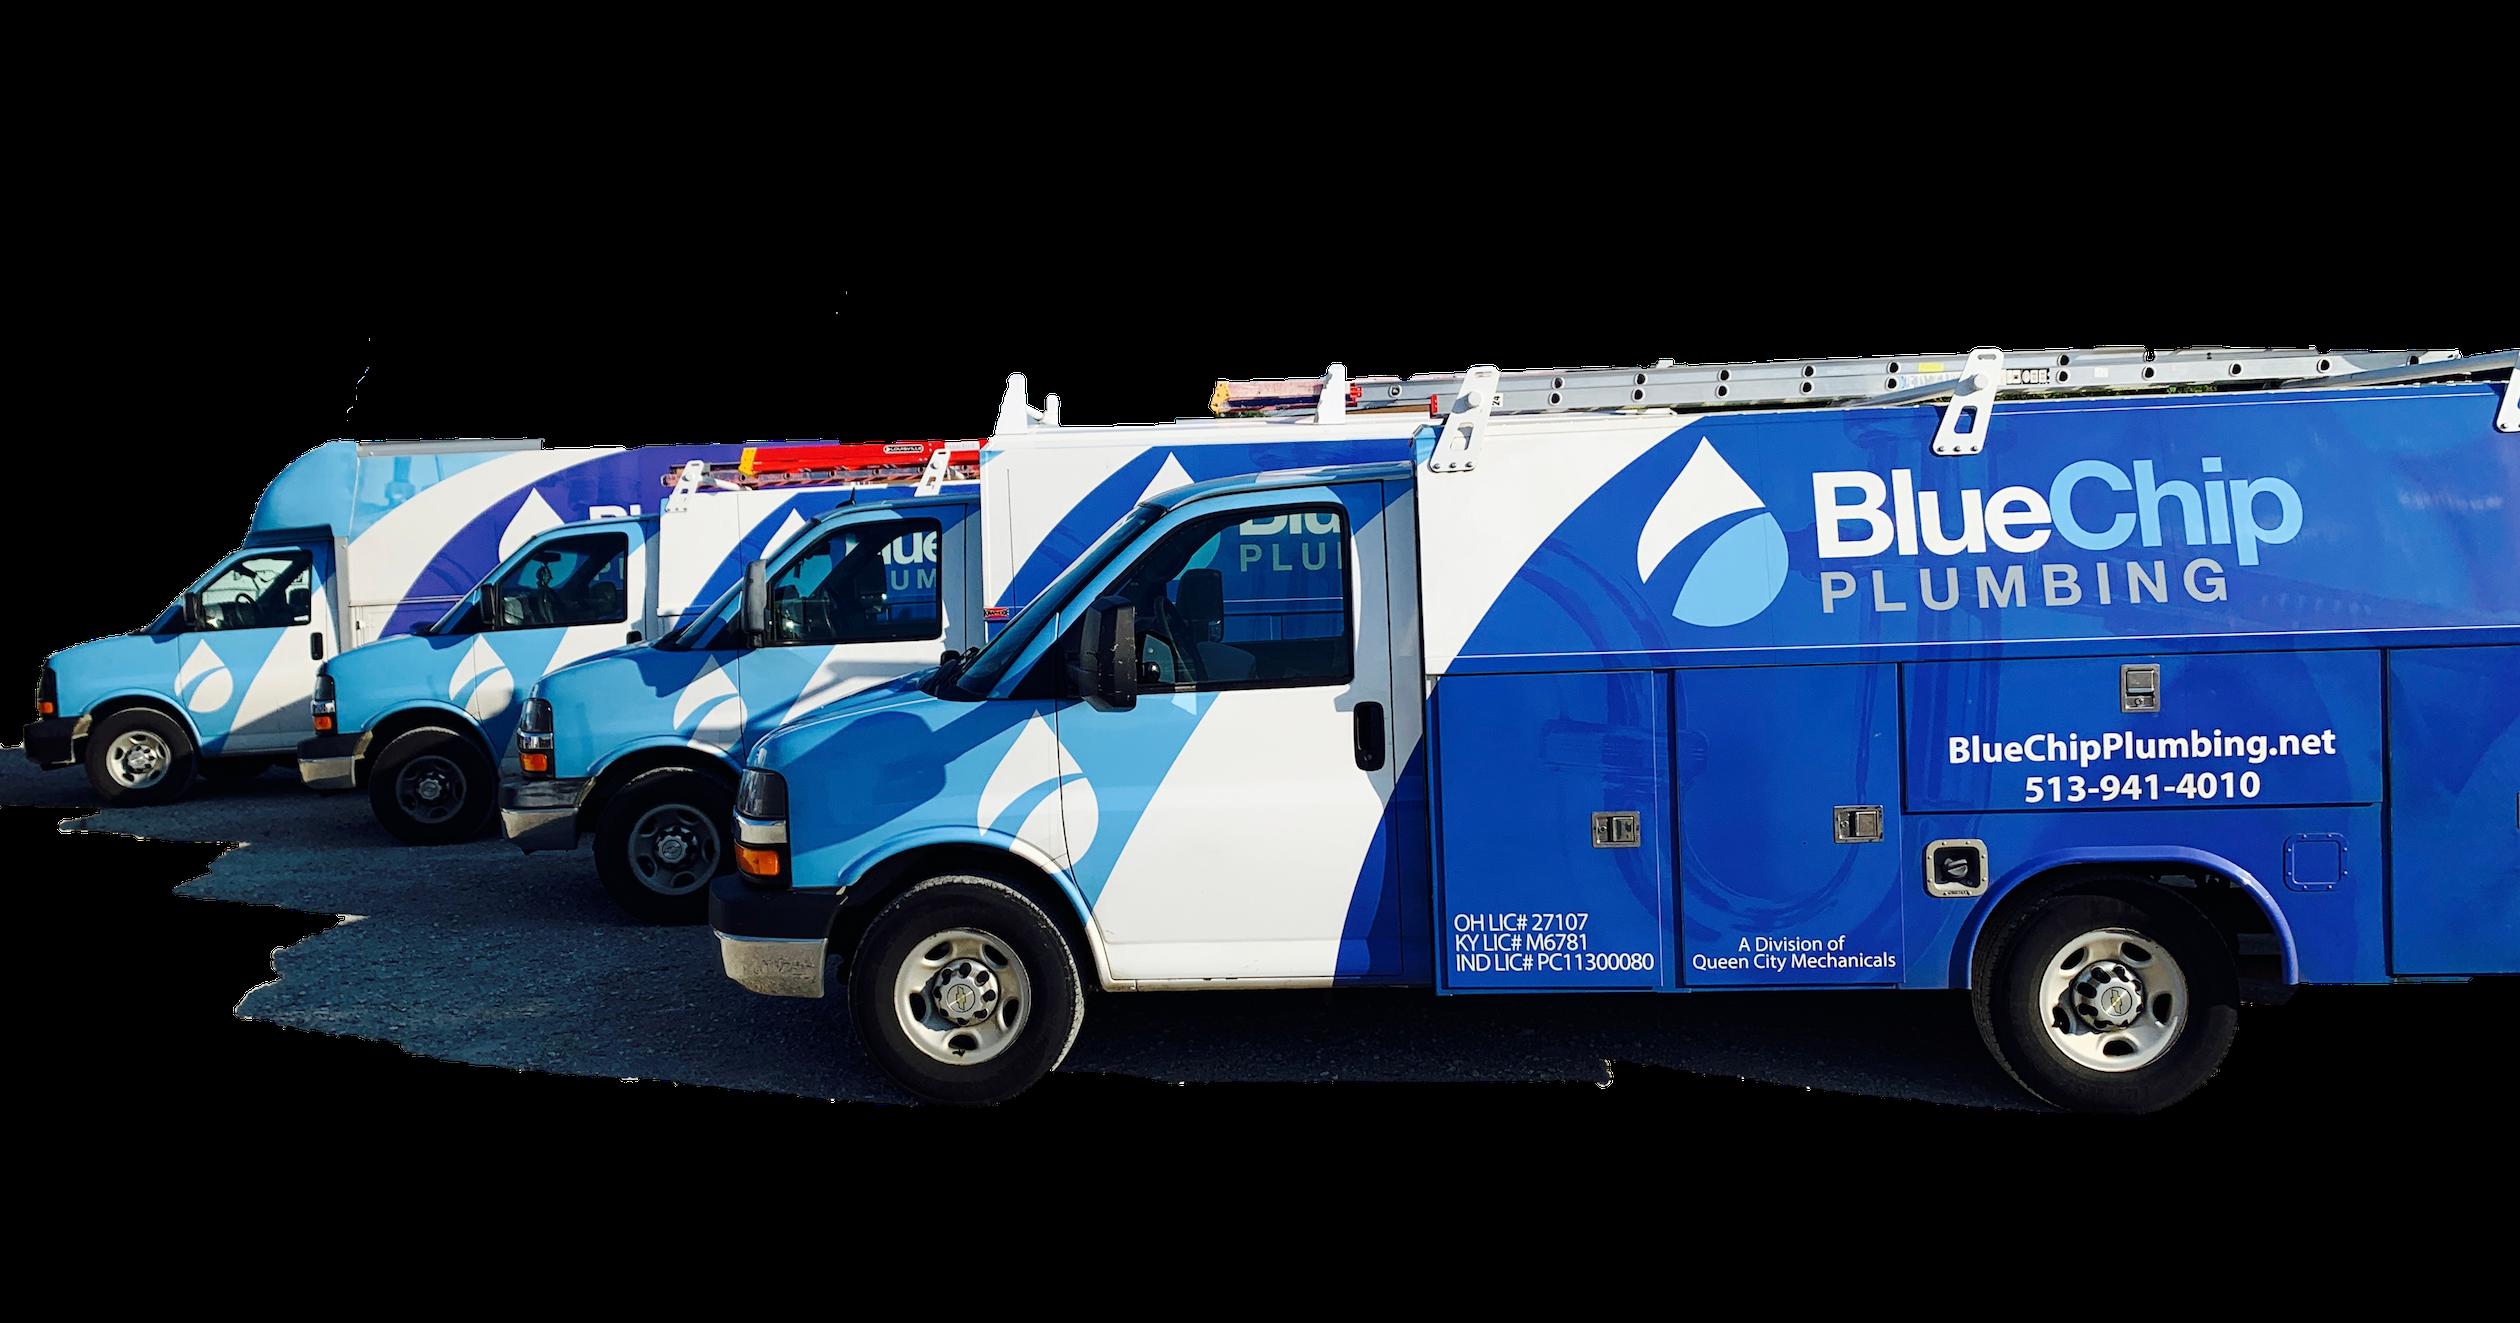 Plumbing Service Vehicles